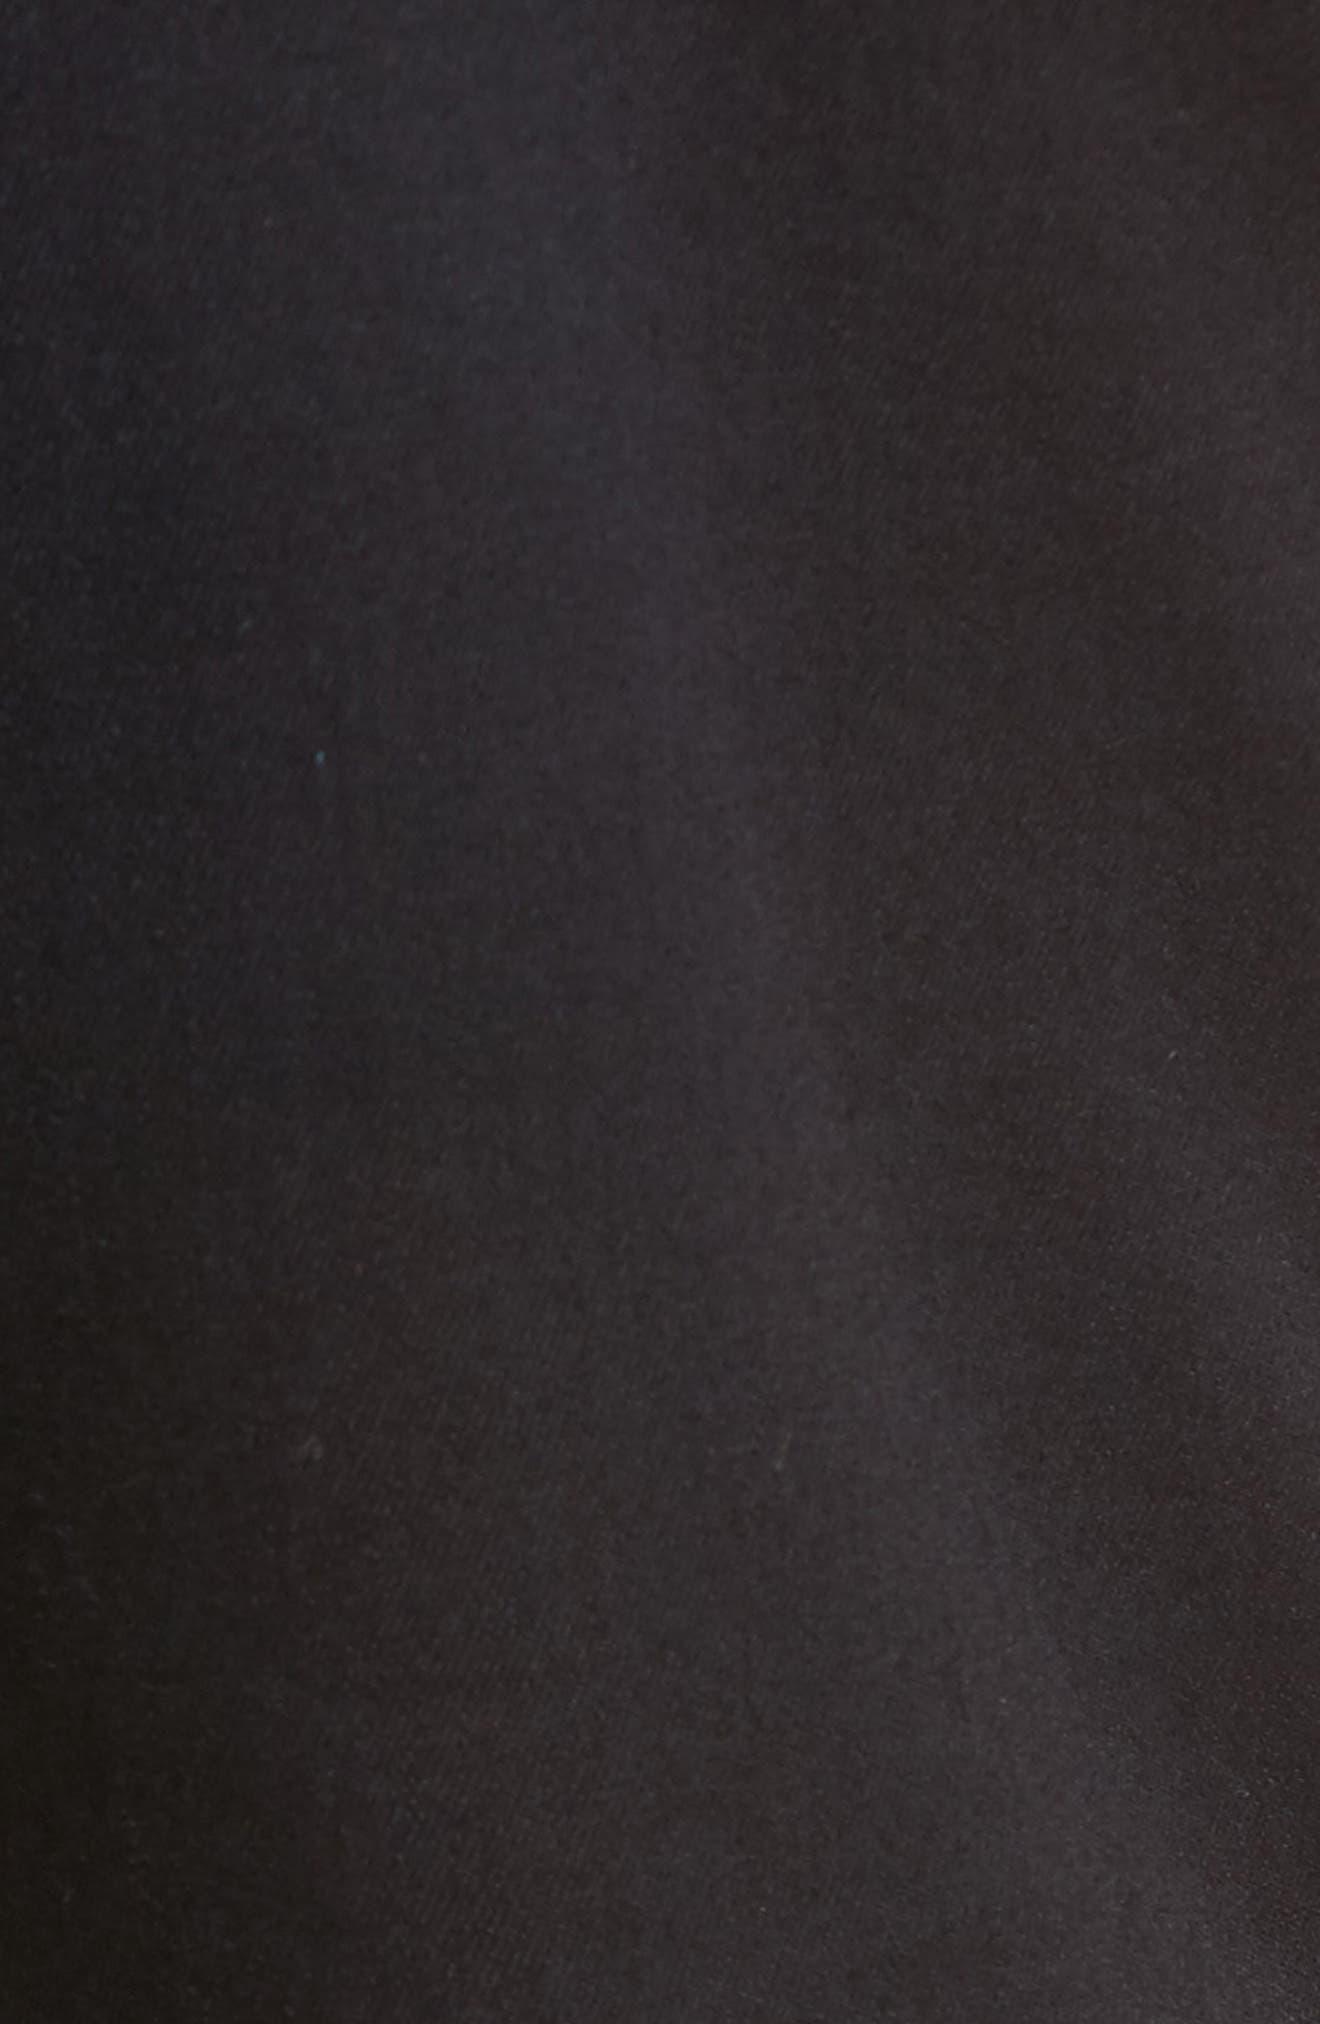 Matt Relaxed Fit Jeans,                             Alternate thumbnail 5, color,                             Blue Black